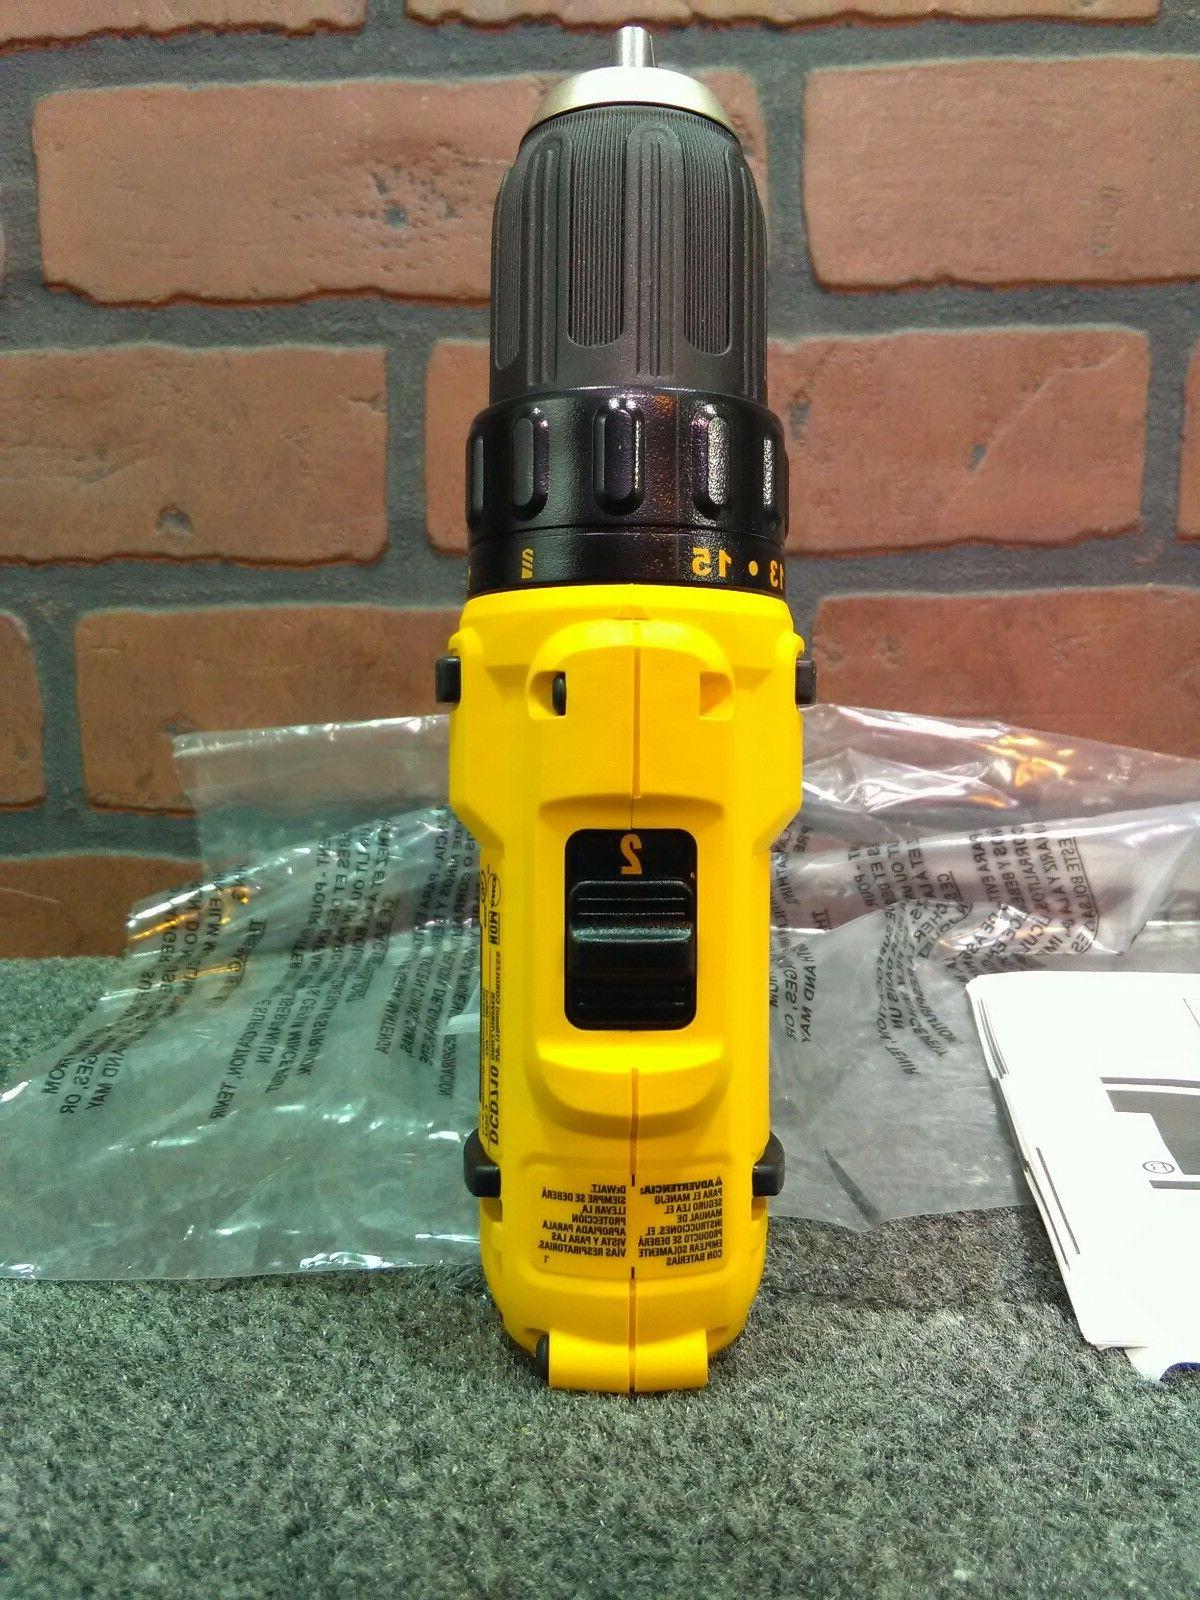 Dewalt DCD710B Cordless in. Drill